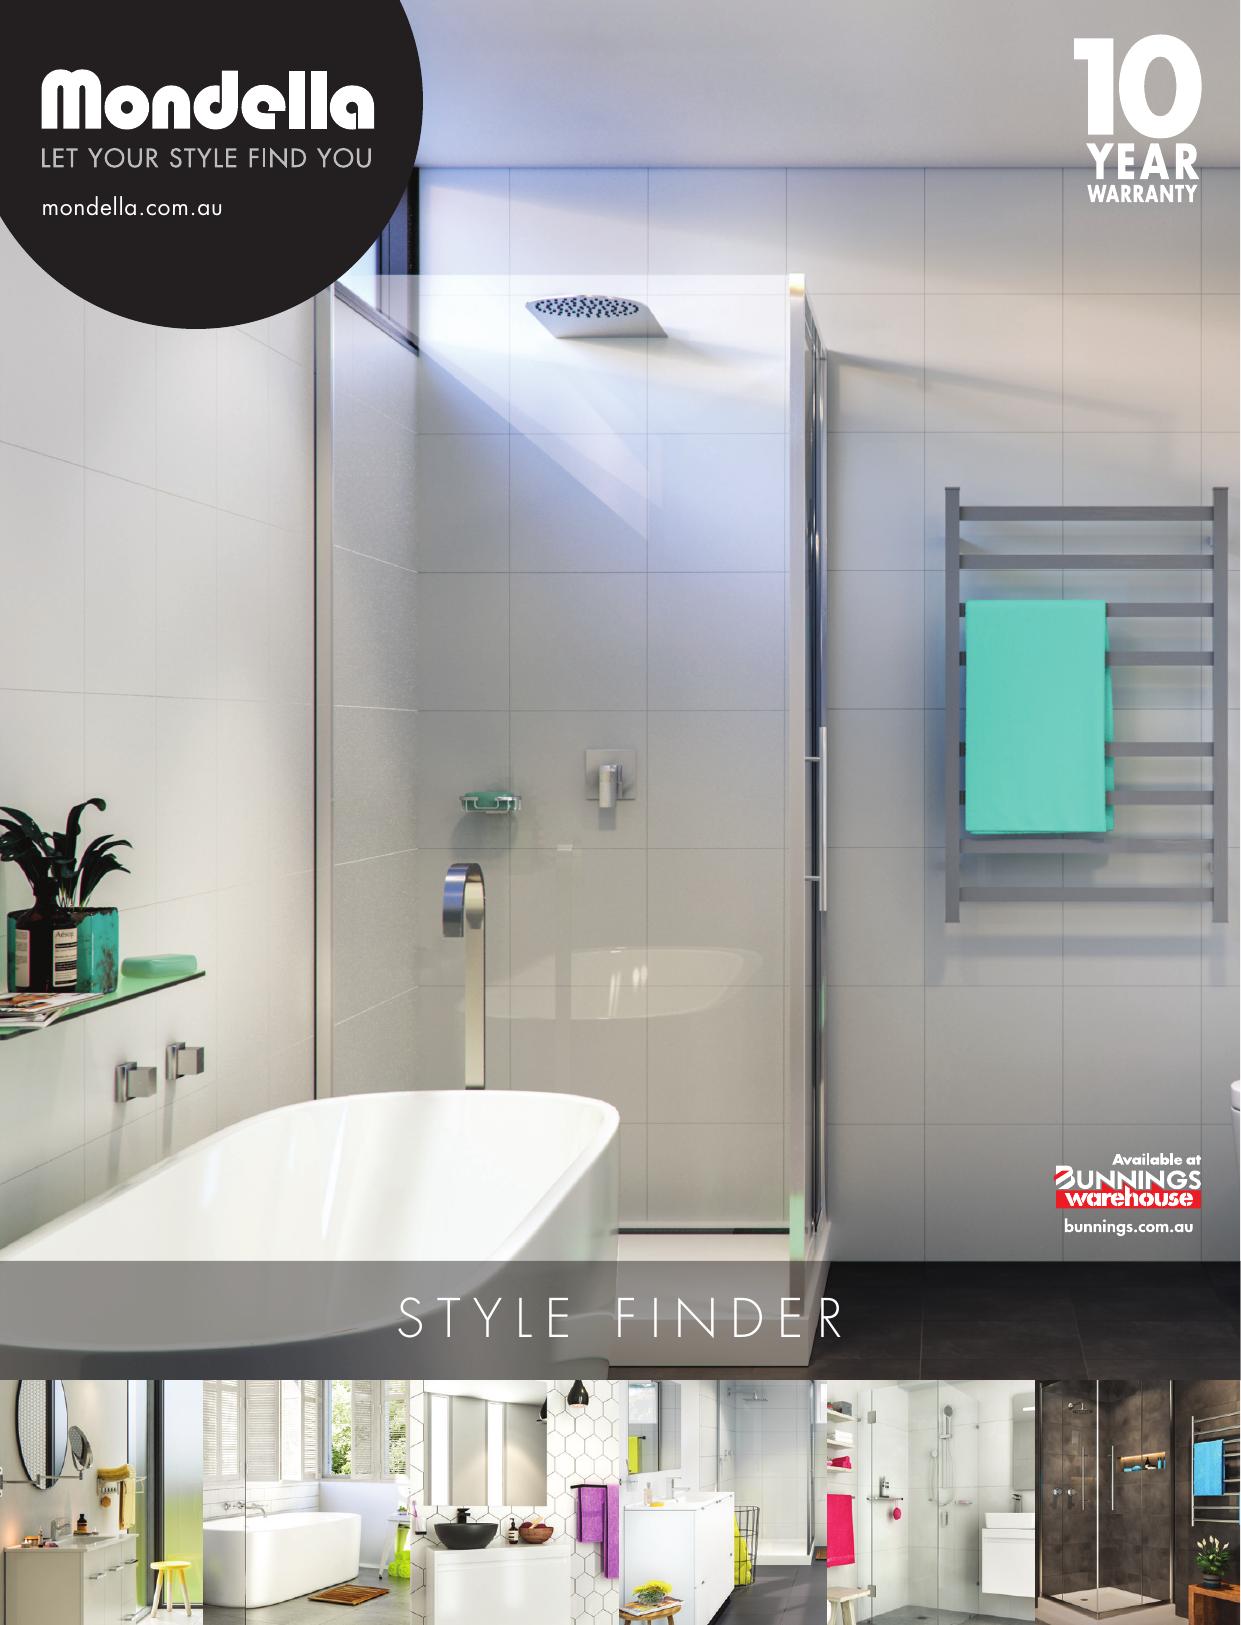 Mondella Vivace Matt Black Vogue Wall Mountable Toothbrush Tumbler Holder New